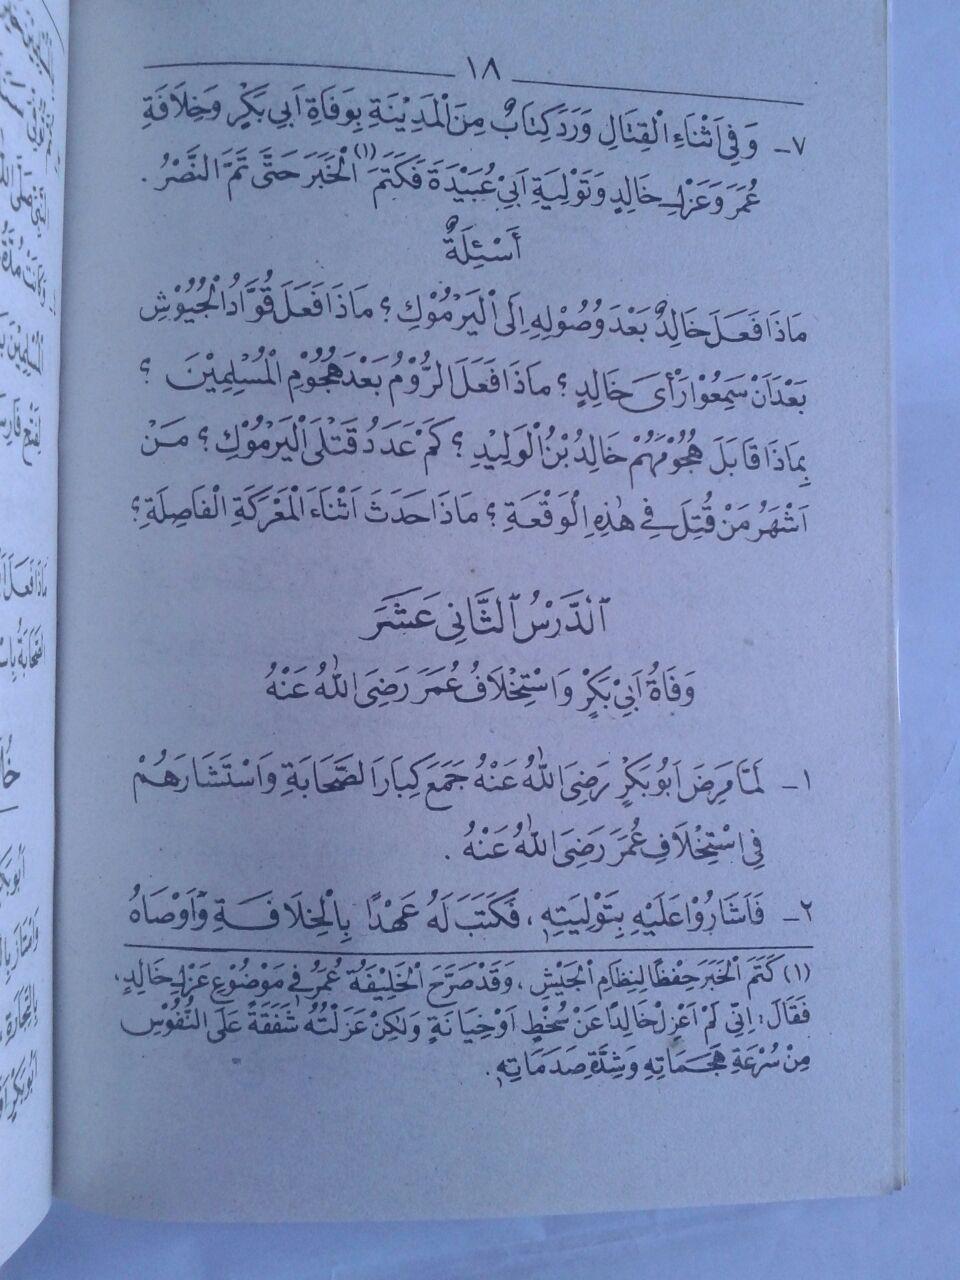 Kitab Khulashotu Nuril Yaqin Fi Siroti Sayyidil Mursalin Set 3 Jilid isi 4